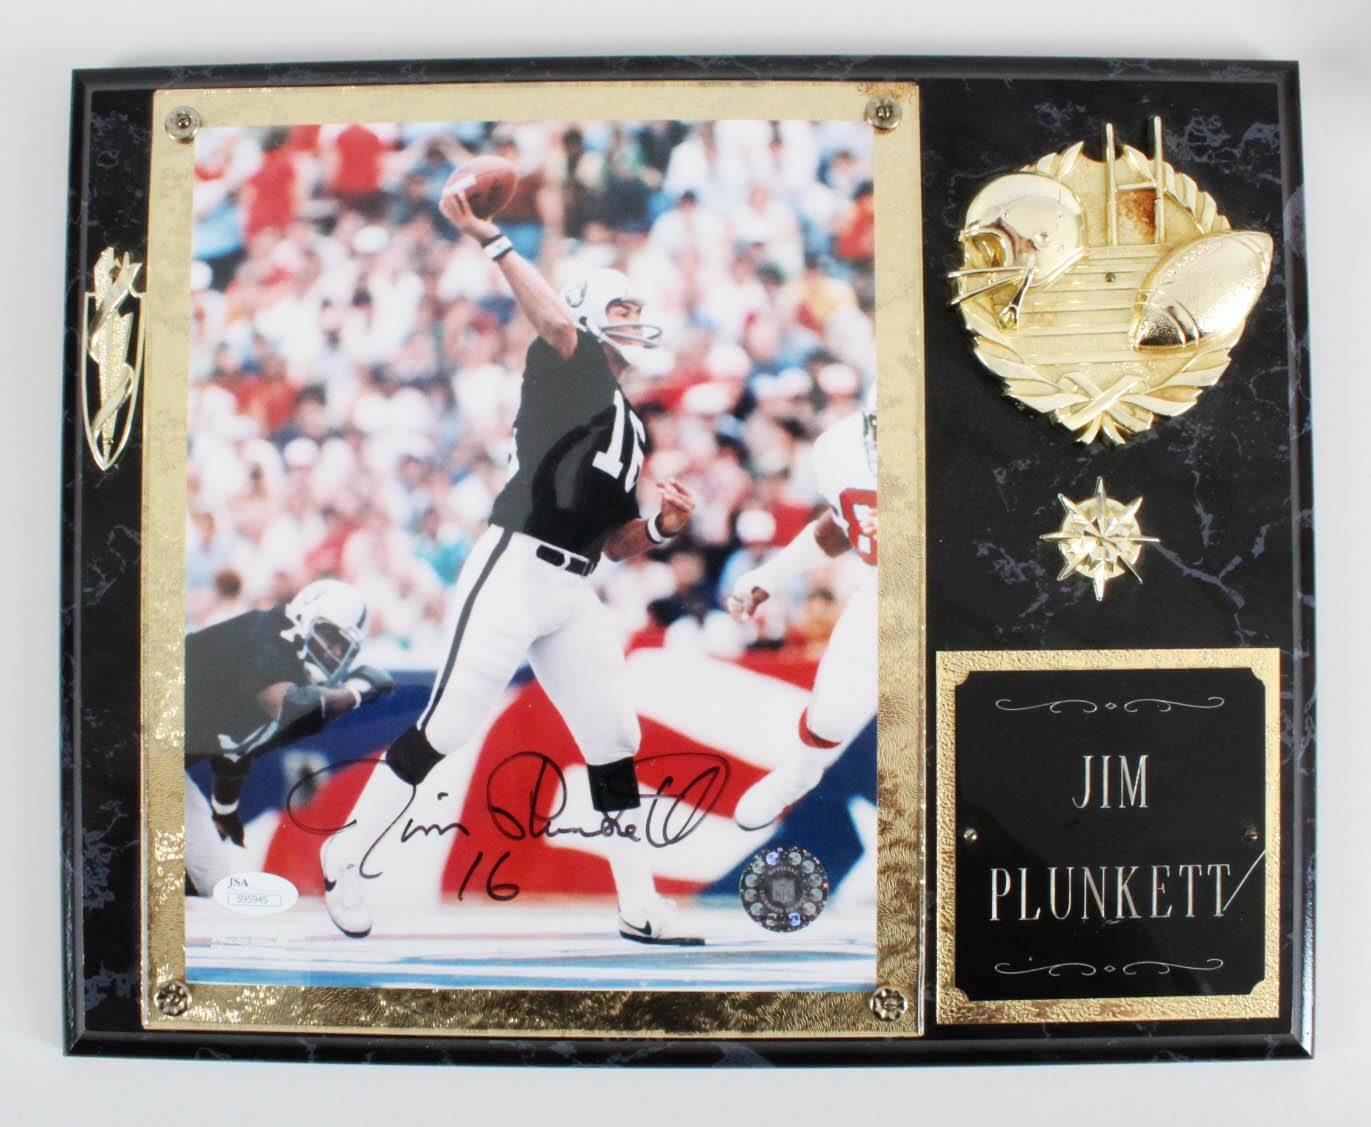 Jim Plunkett Signed Photo Plaque Raiders - COA JSA